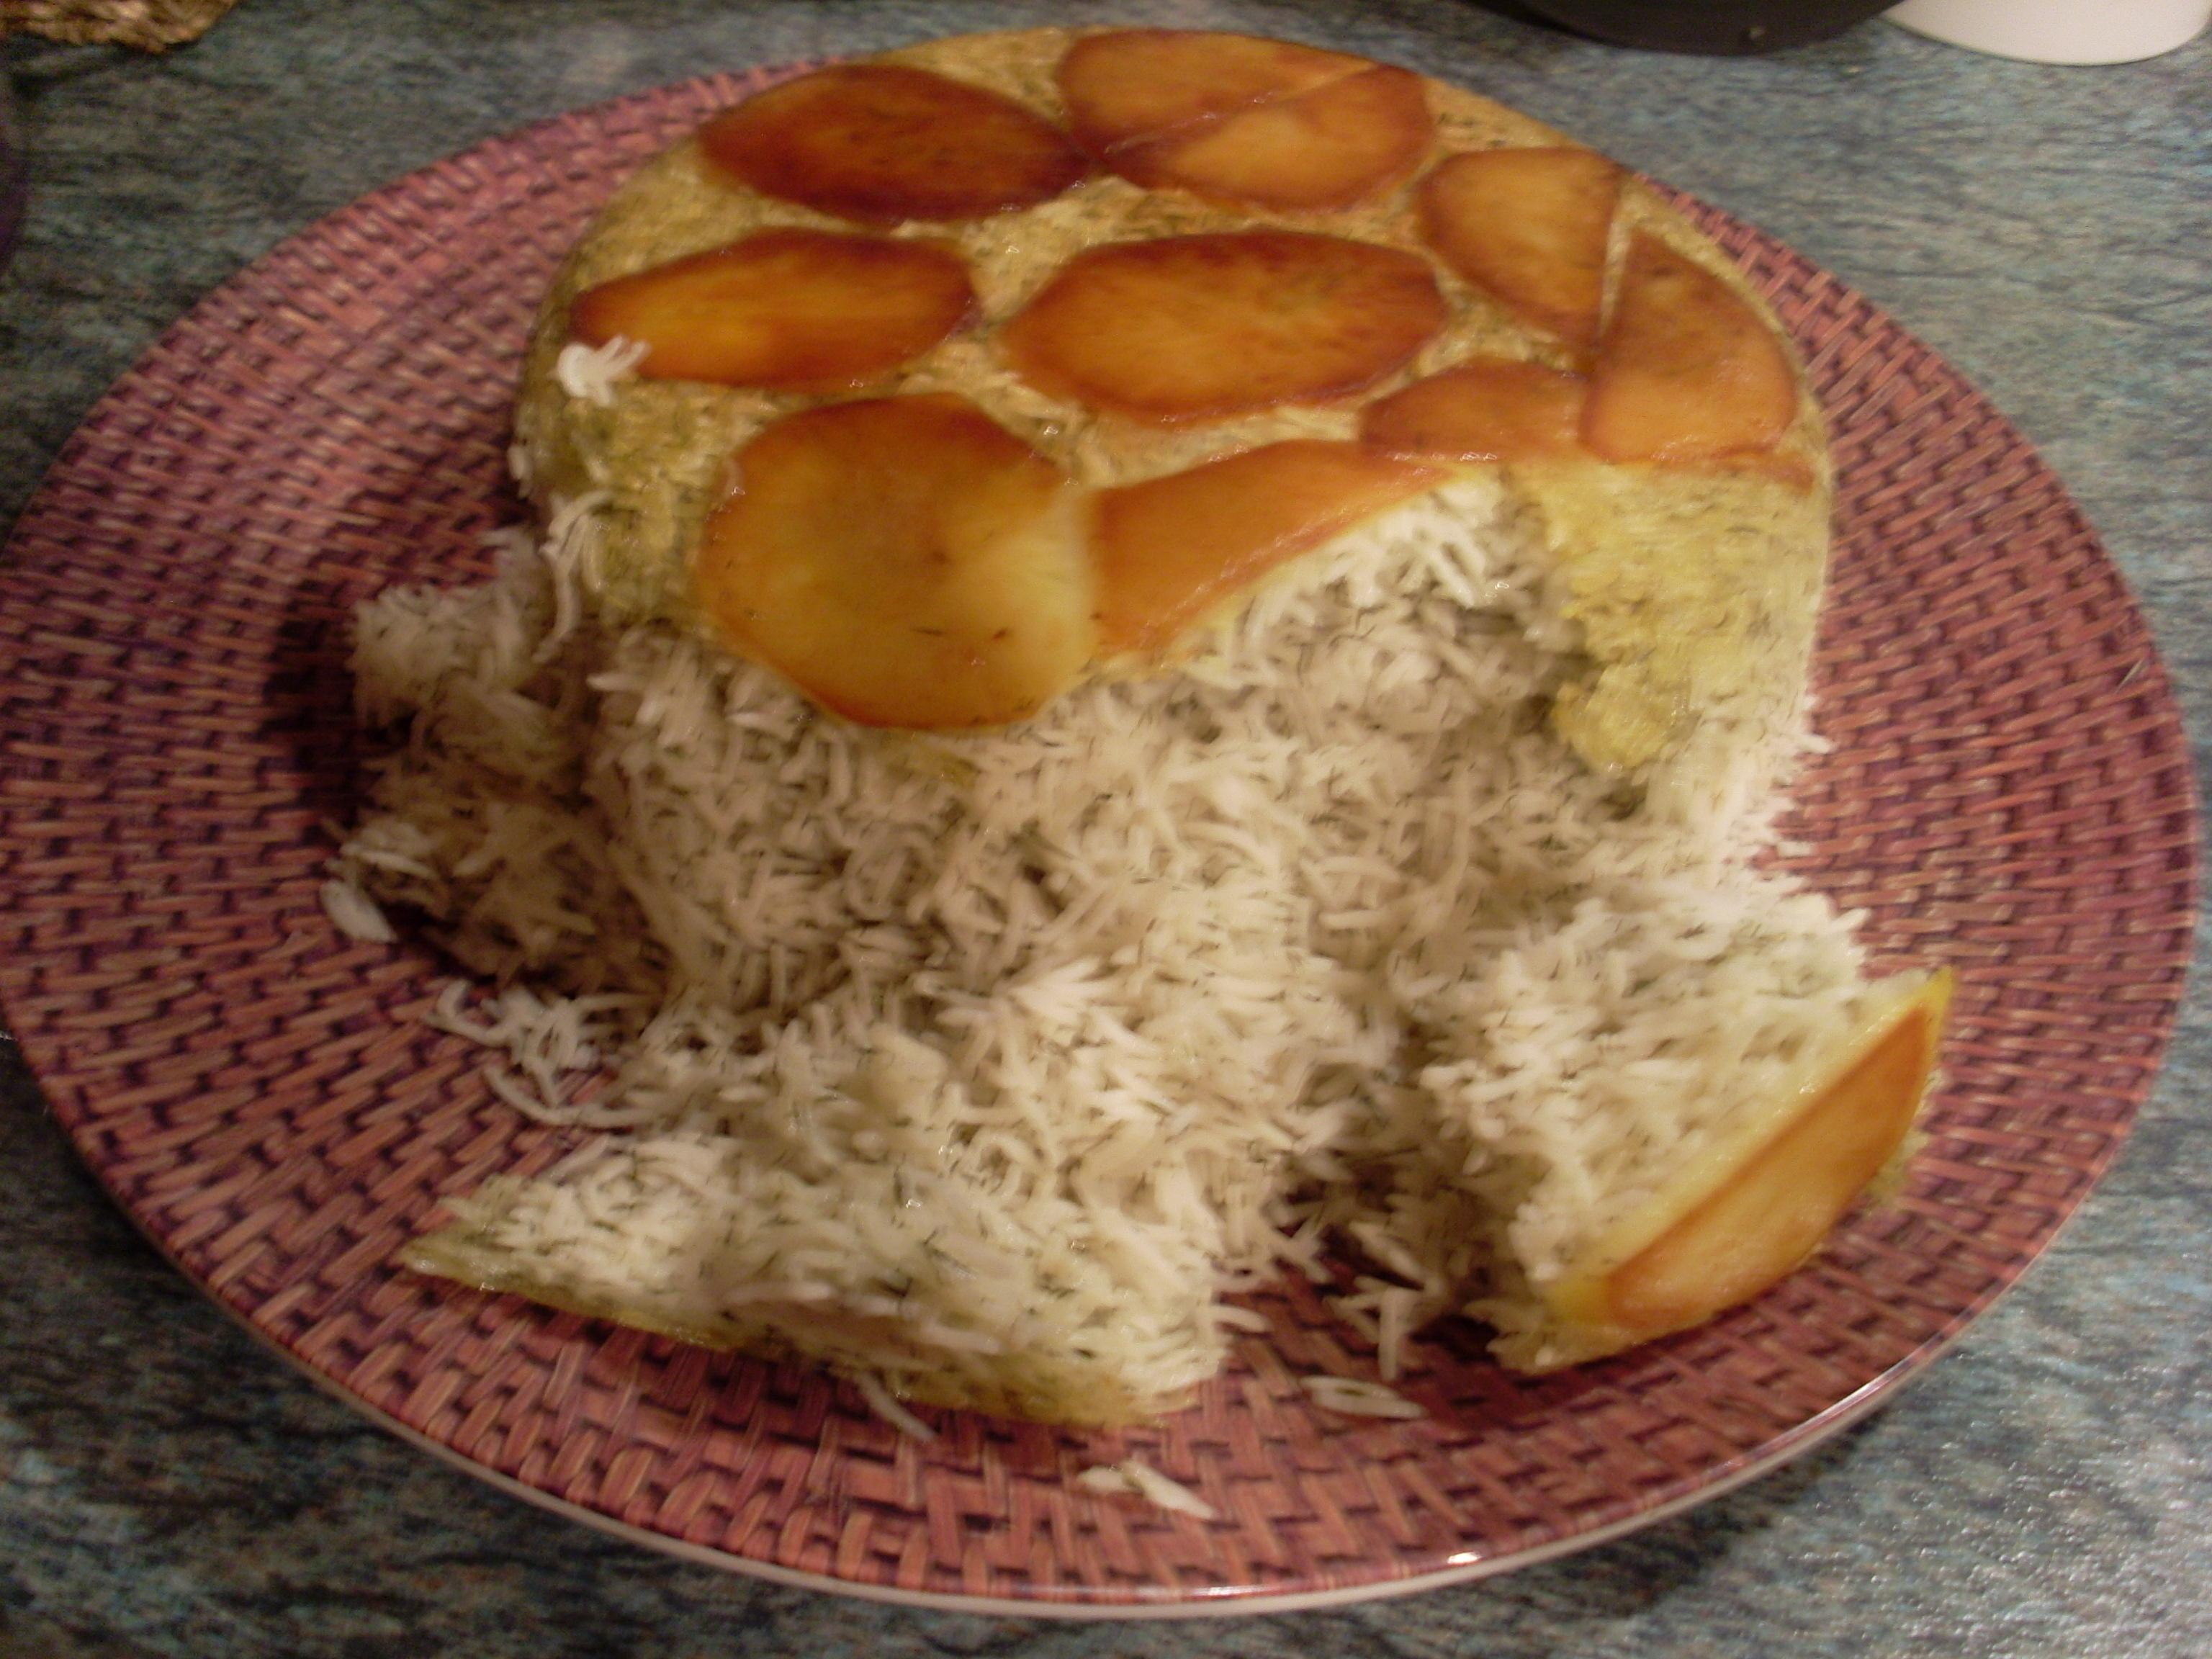 Shivid javanehs kitchen persian cuisine 4 forumfinder Choice Image